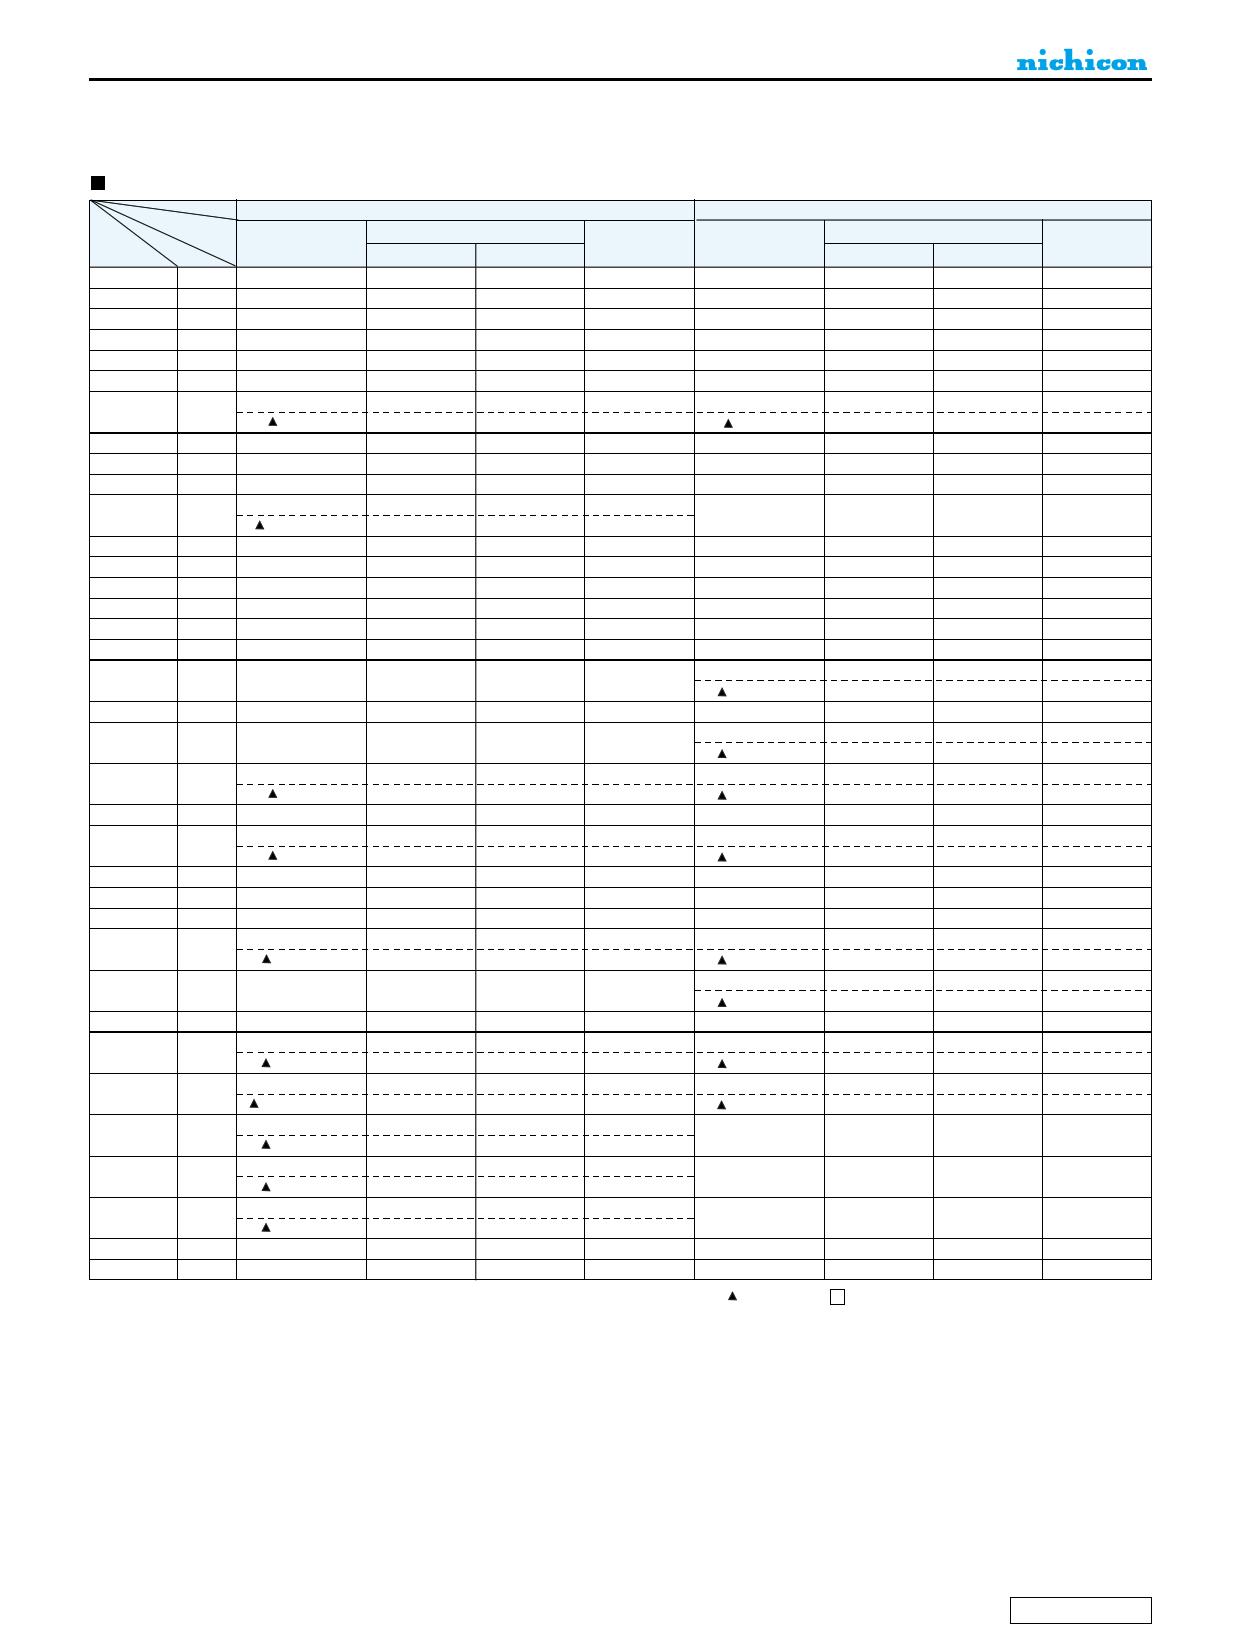 UPW1H121MPD6 pdf, 반도체, 판매, 대치품